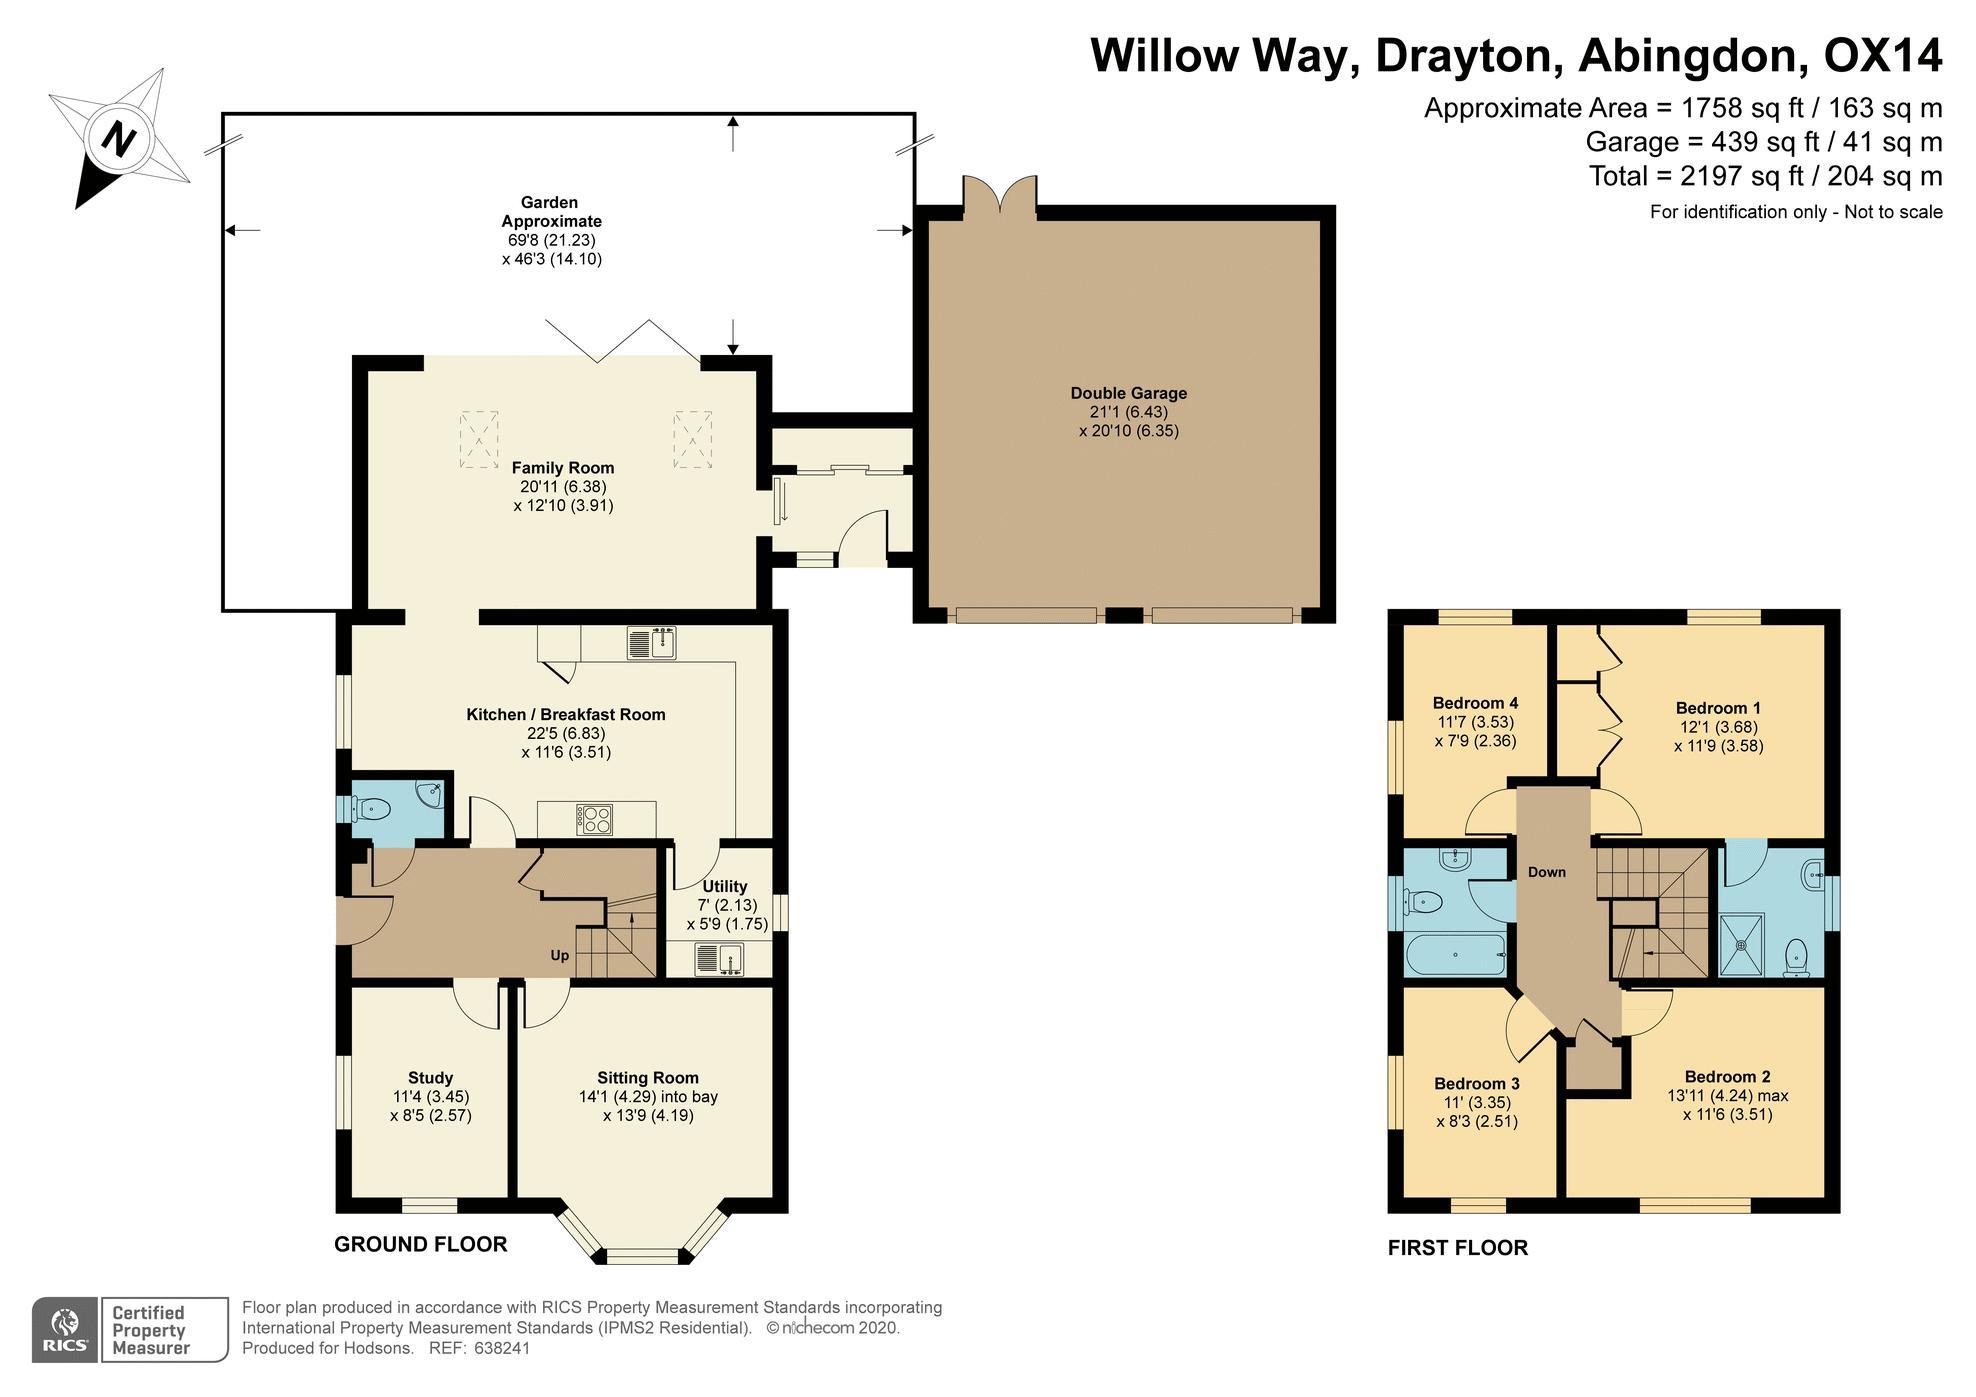 Willow Way Drayton